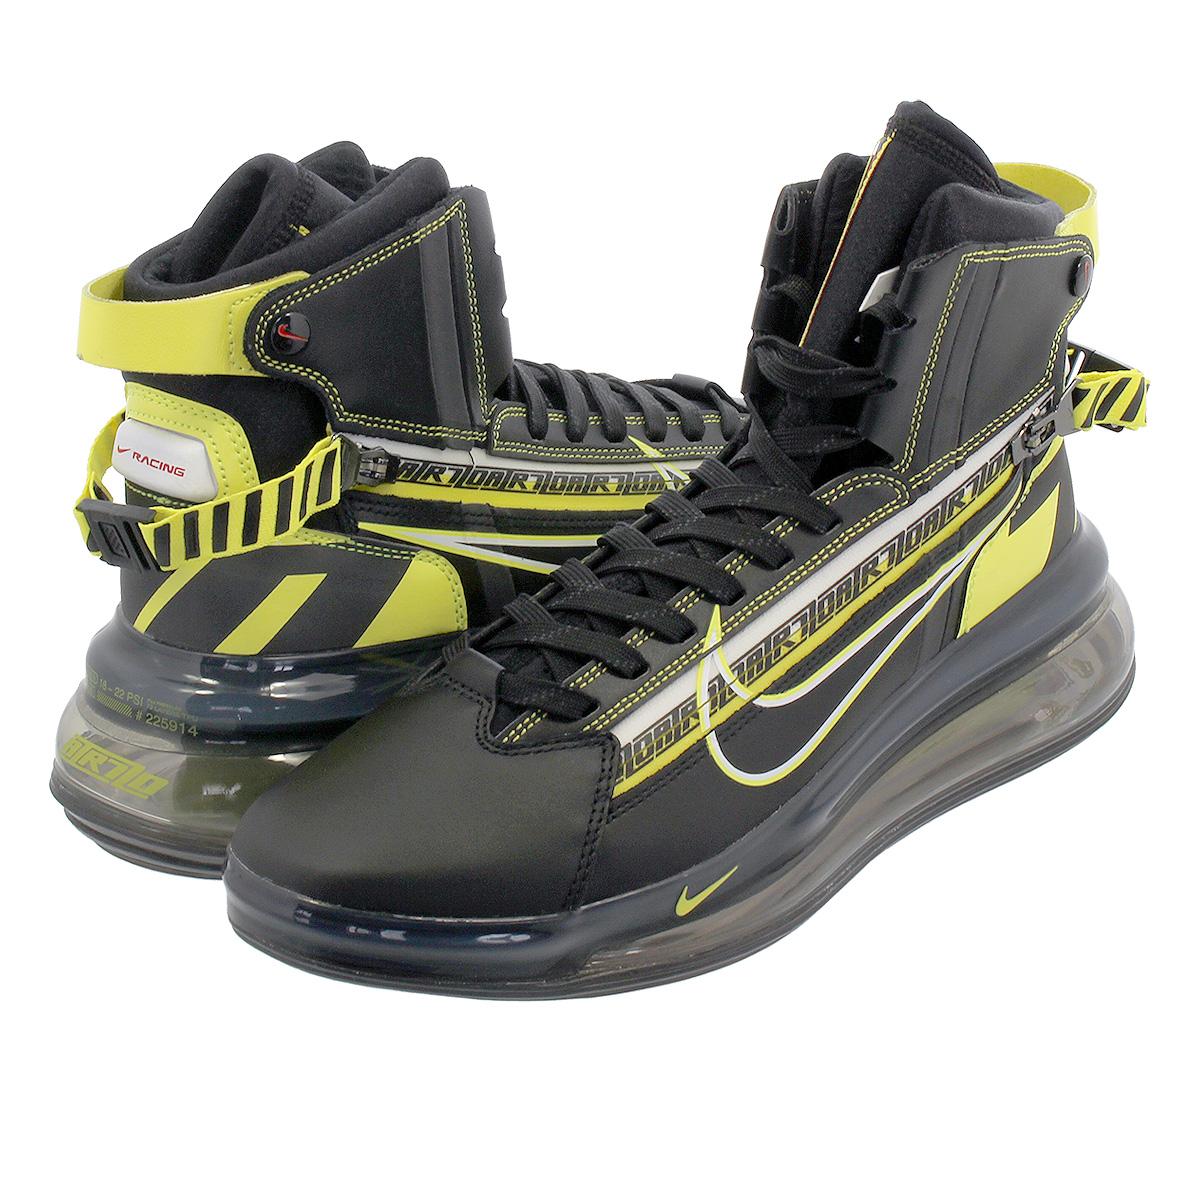 half off ba0a6 52f15 メンズ 靴 スニーカー ブラック 黒 bv7786-001 NIKE AIR MAX 720 SATURN ナイキ エア マックス